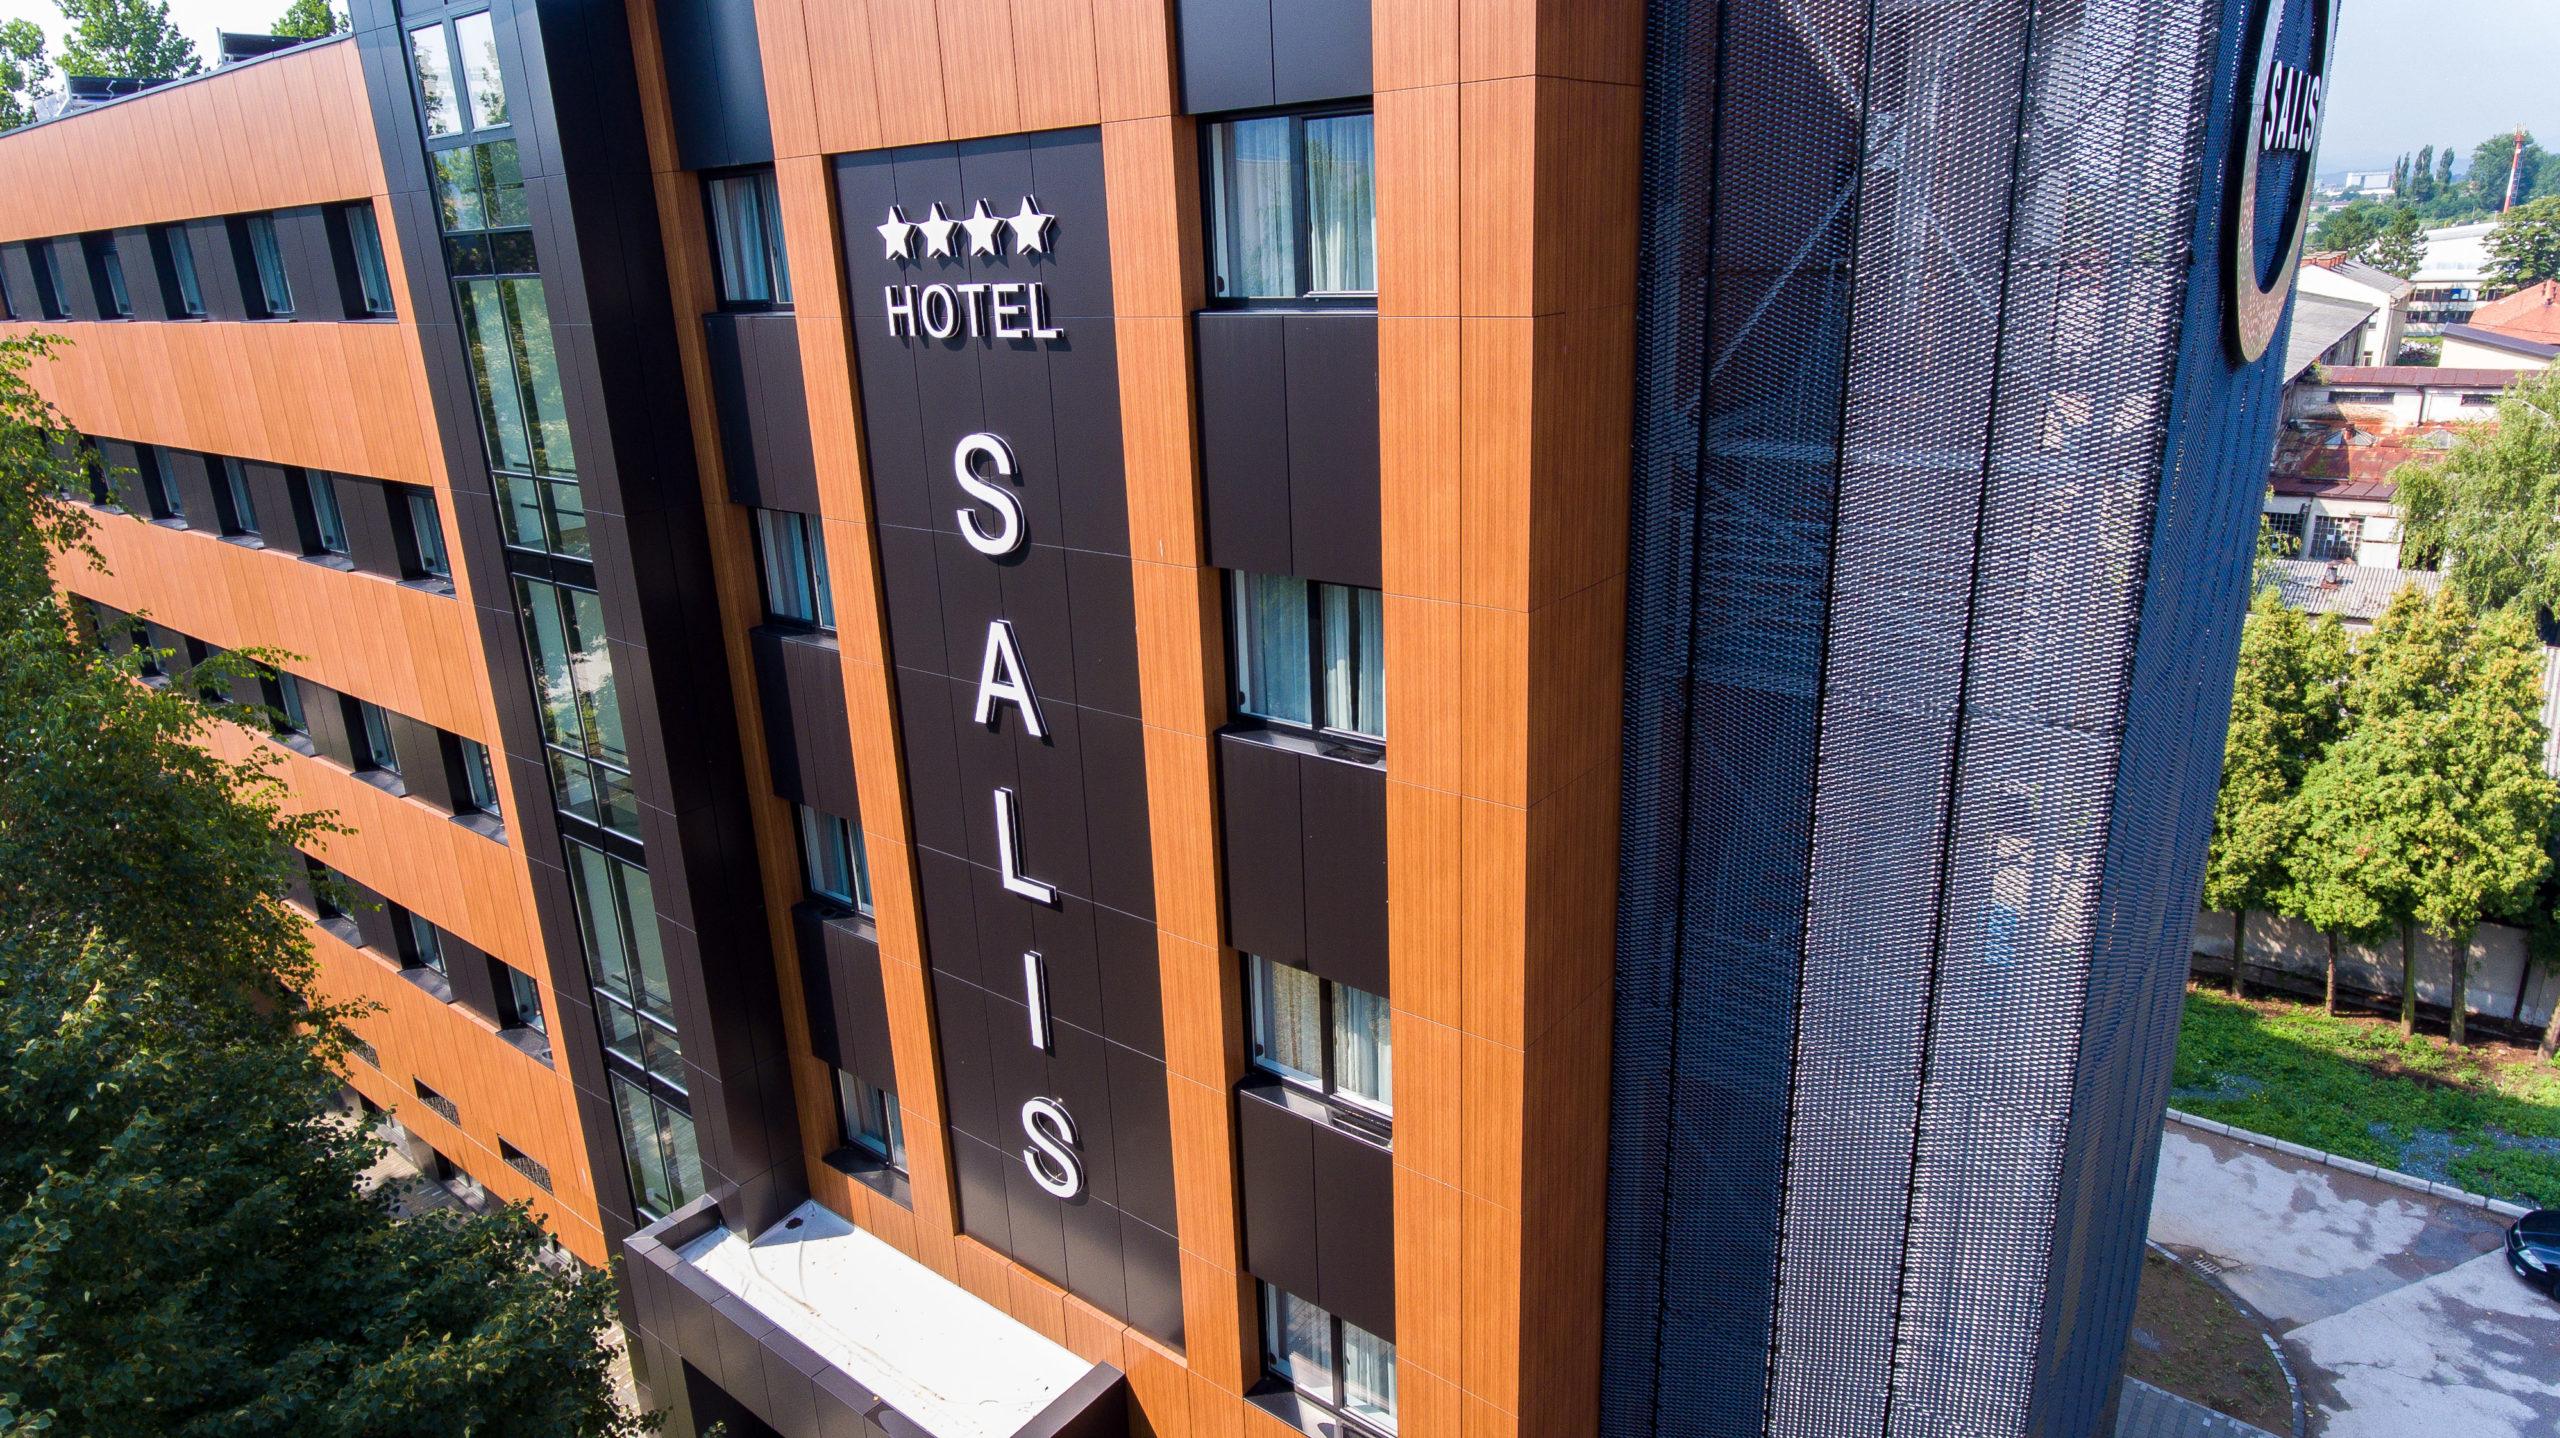 Foto: Hotel Salis/promo